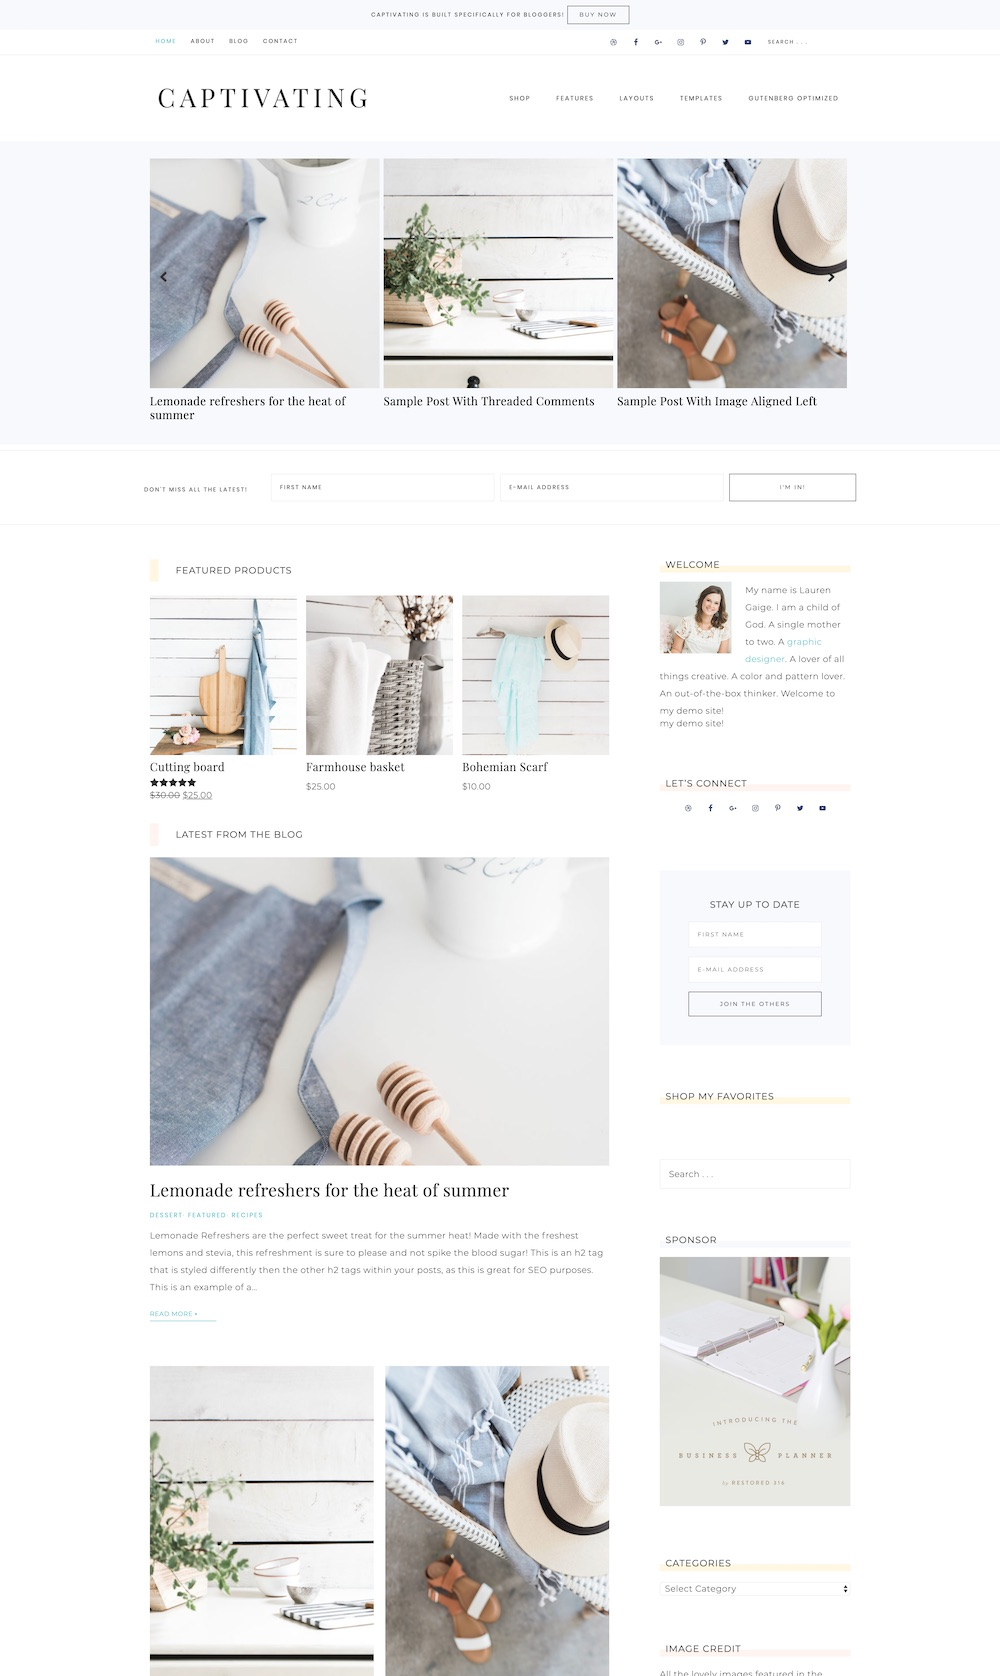 Captivating WordPress theme | Clean, magazine-style WordPress theme